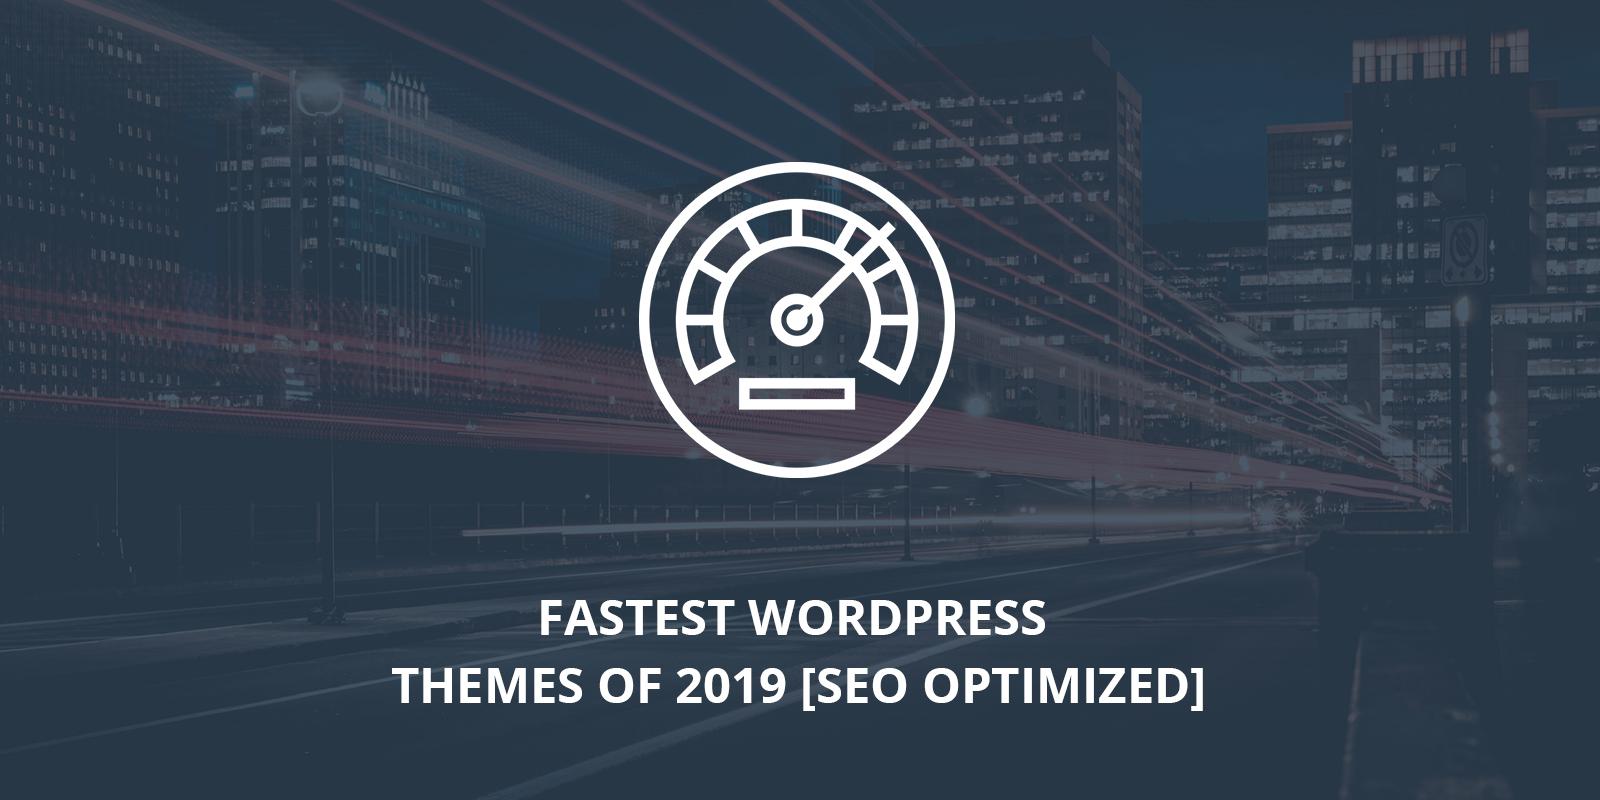 The Fastest WordPress Themes of 2019 [SEO Optimized]